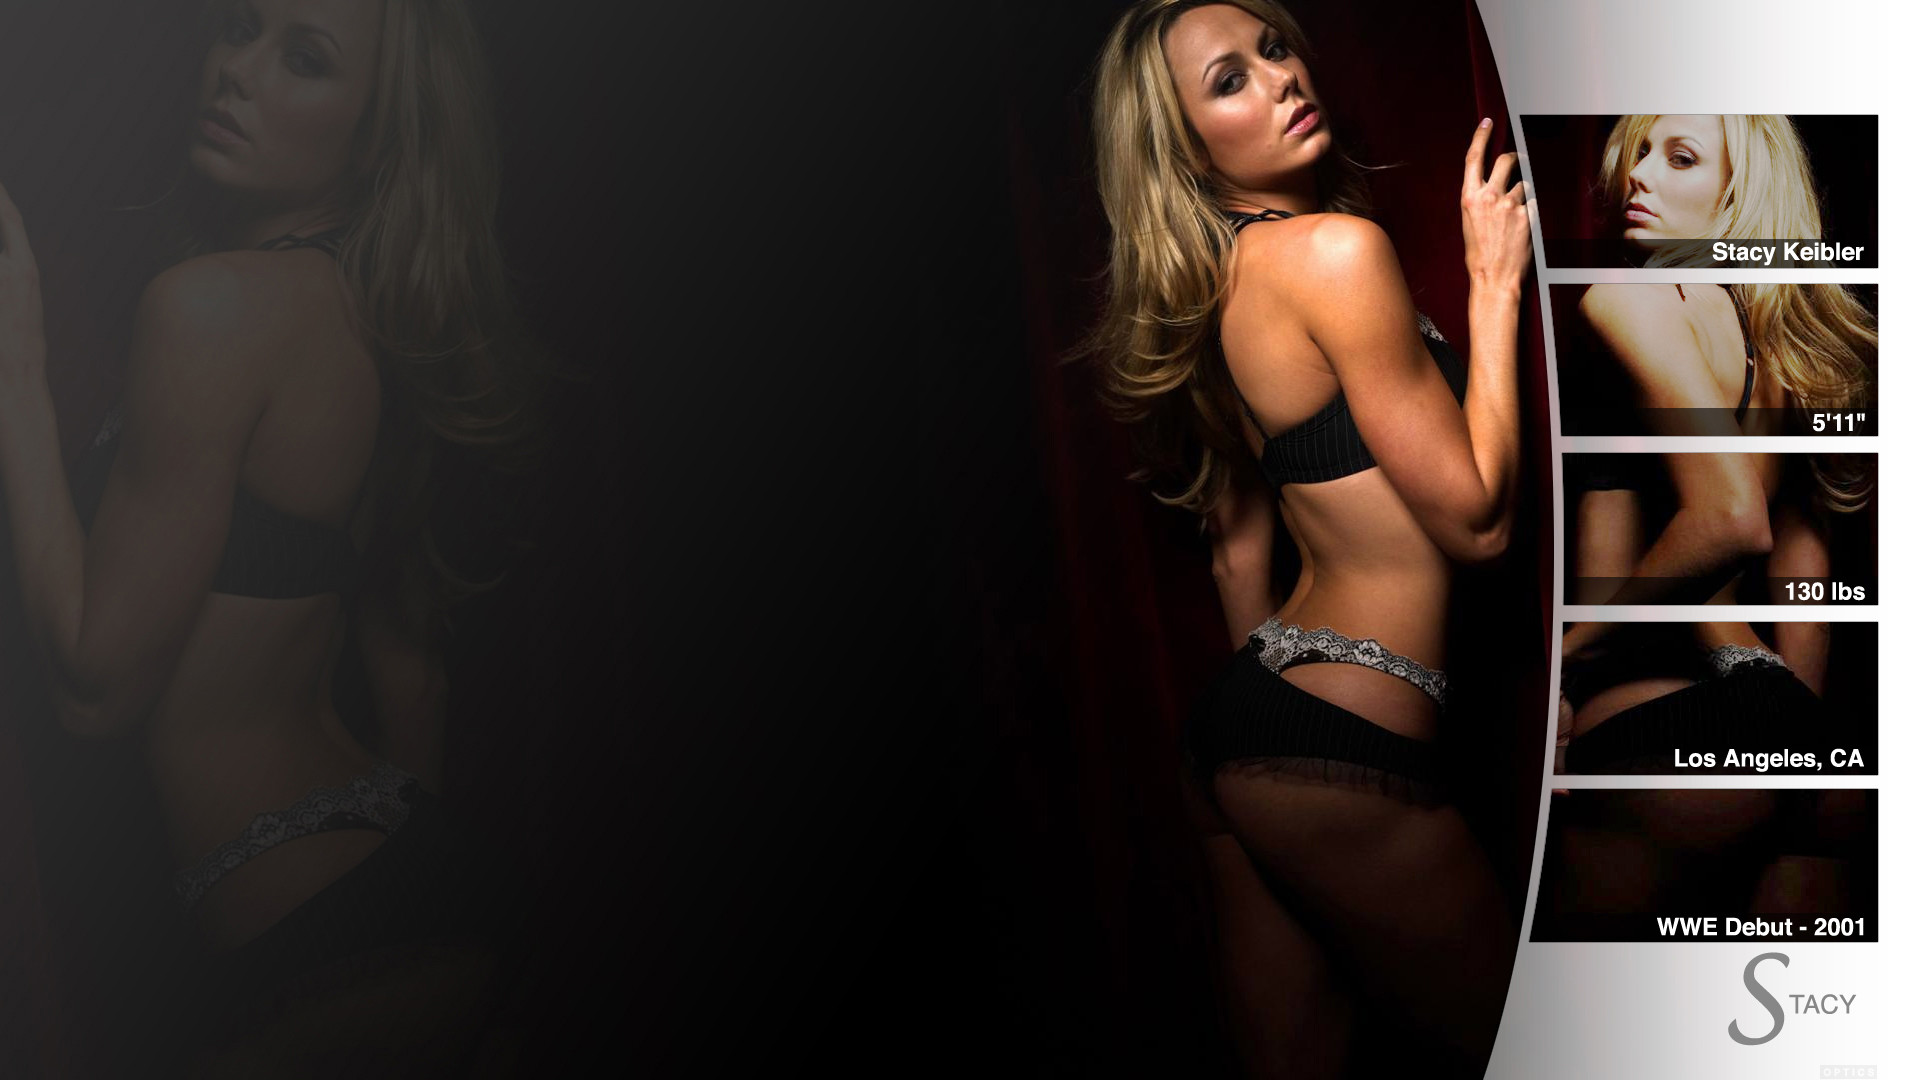 … Stacy Keibler – WWE Wallpaper by 0PT1C5